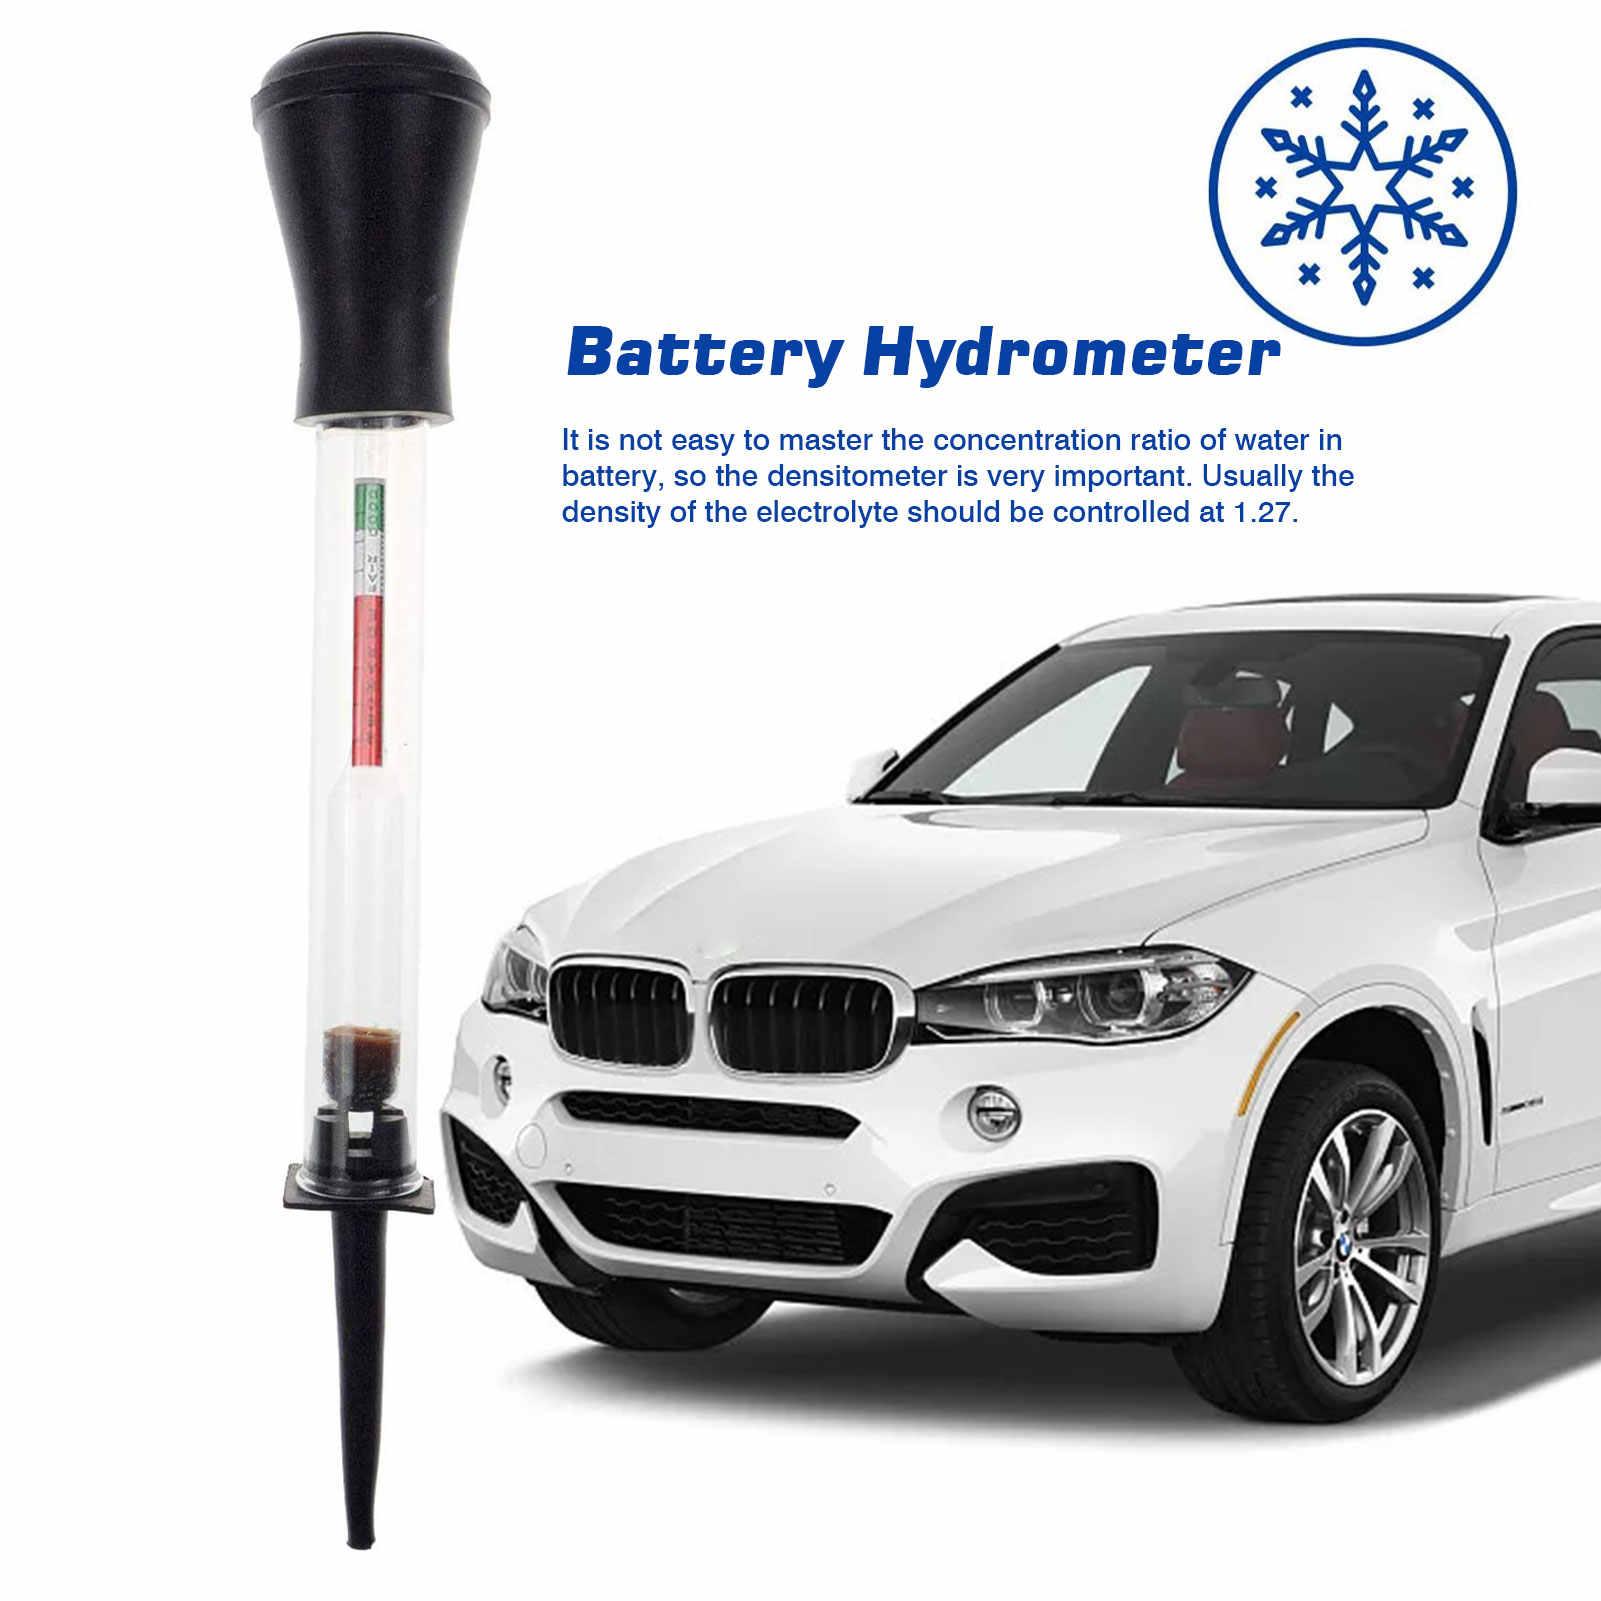 Battery Hydrometer,Auto repair 8-inch hydrometer Fast Dectection Electro-Hydraulic Density Meter Car Repairing Tools